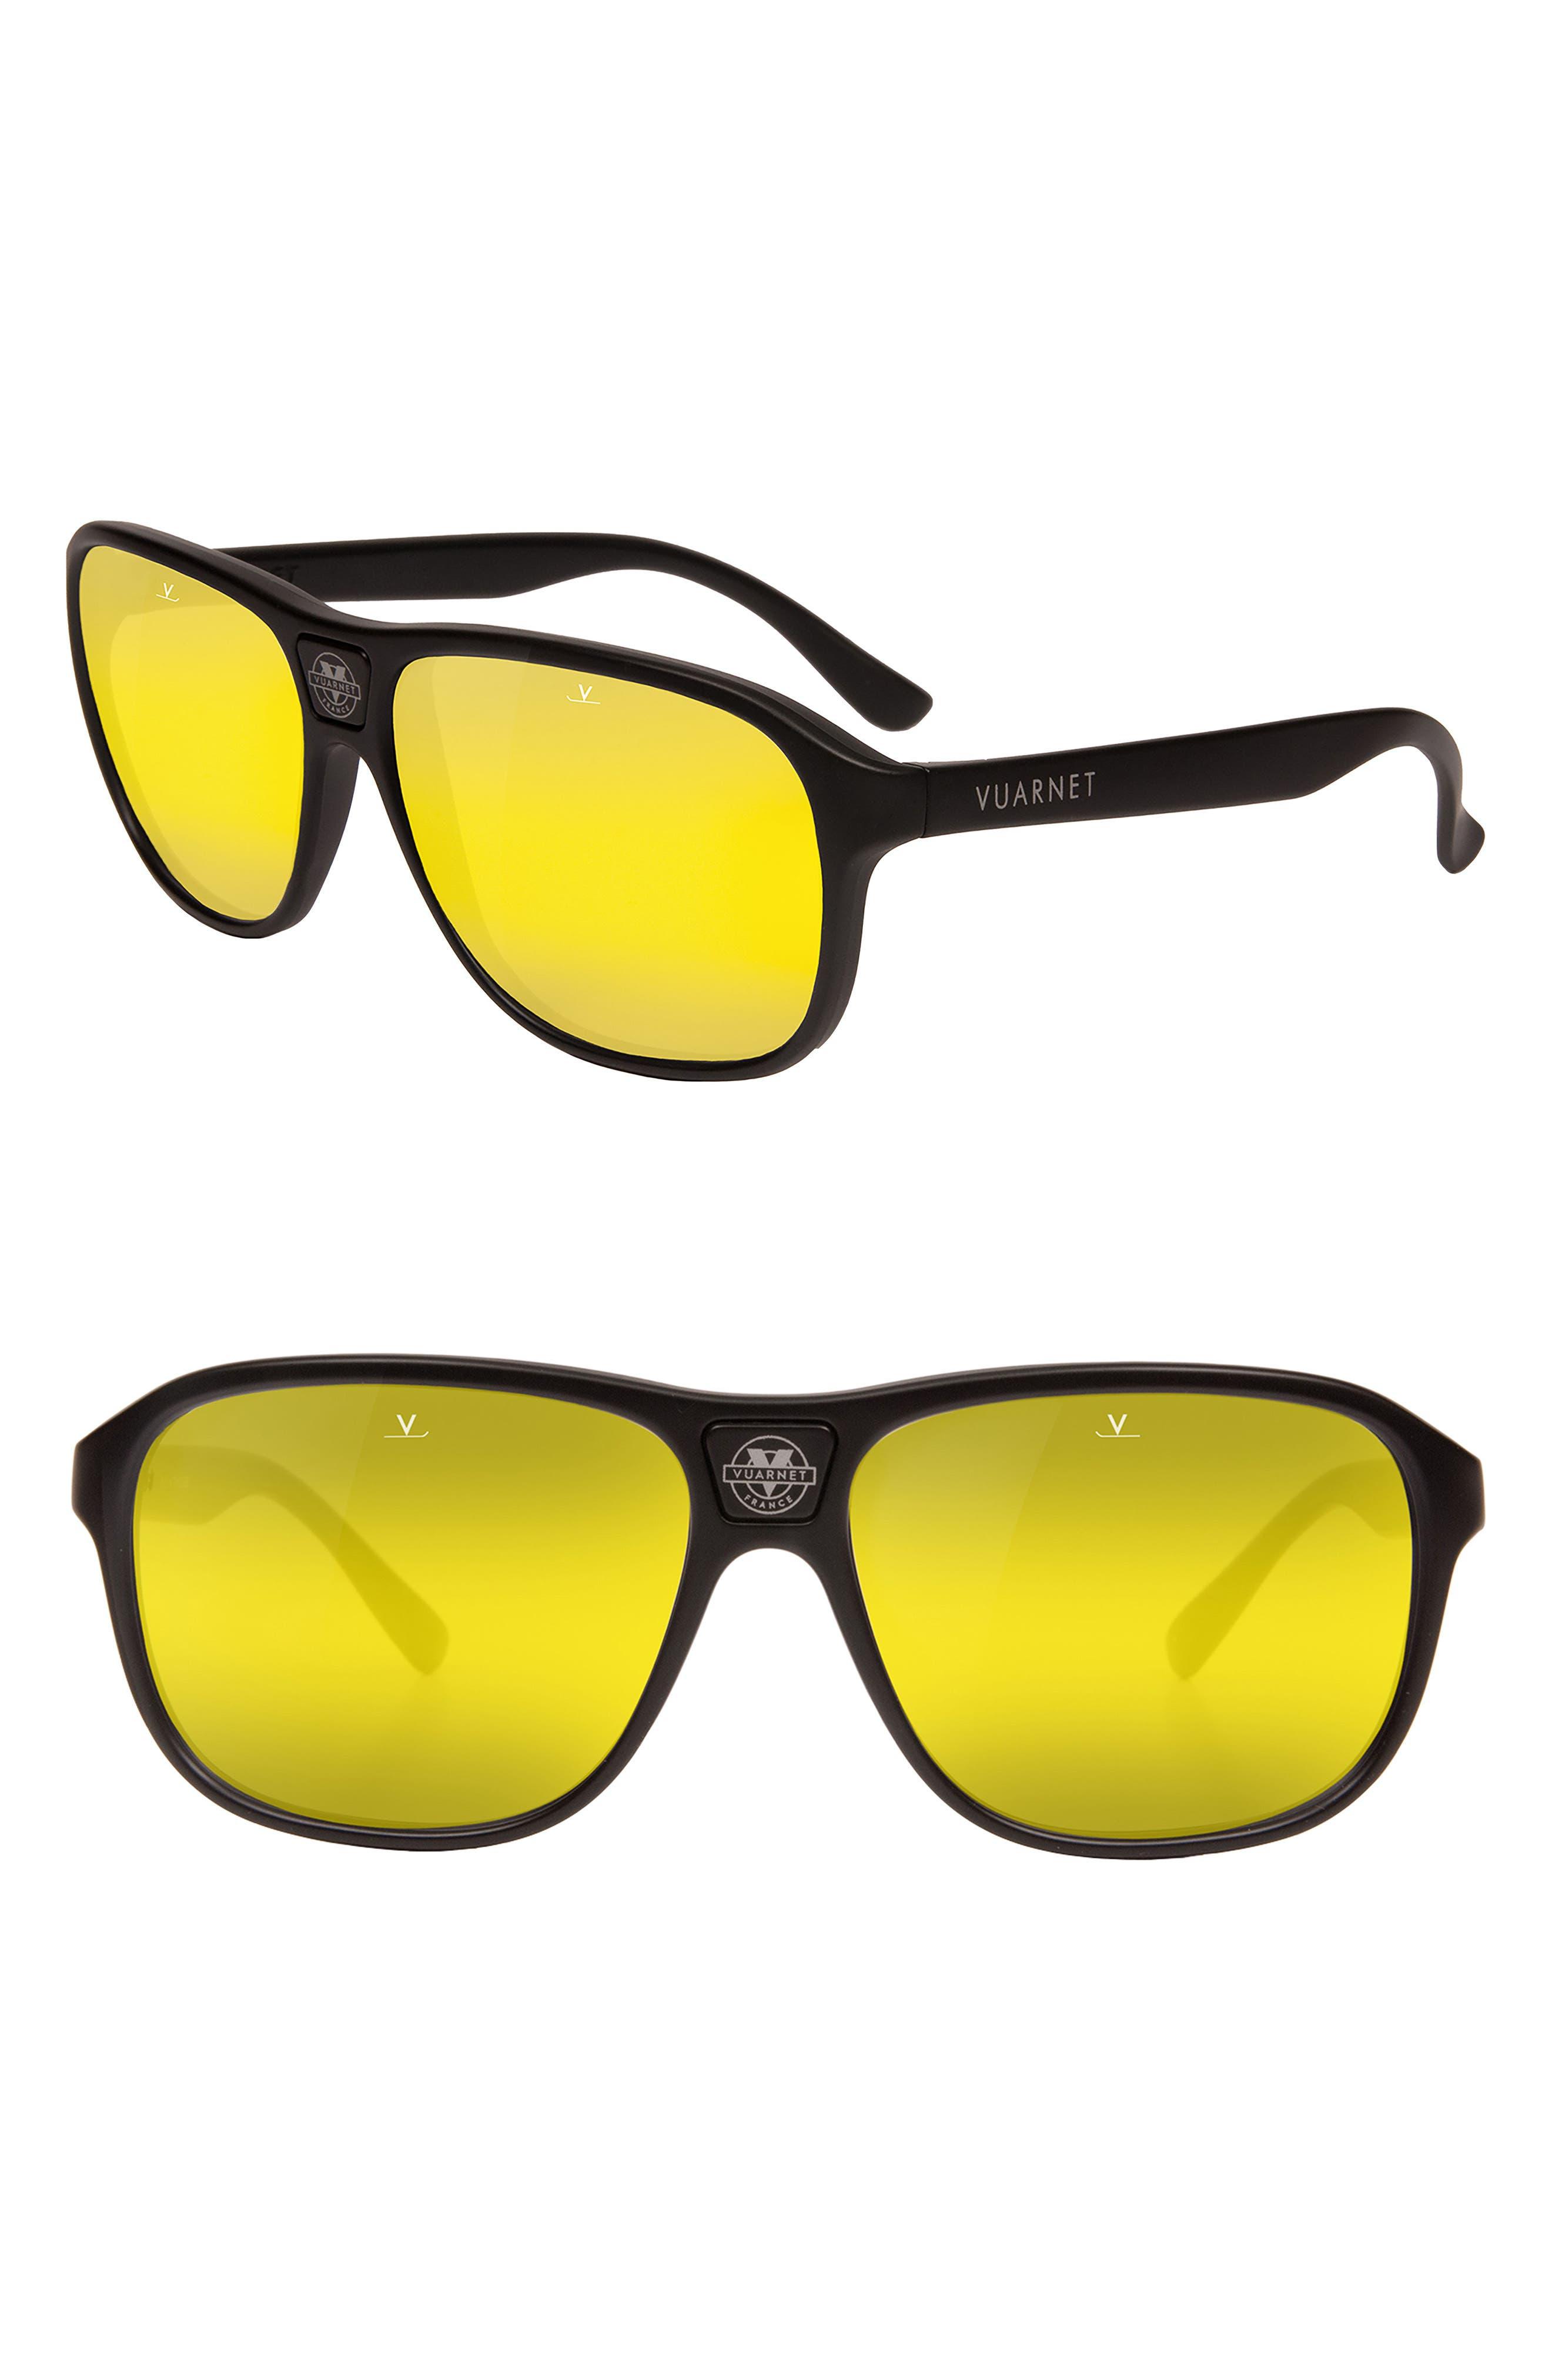 Legends 03 56mm Sunglasses,                         Main,                         color, Nightlynx